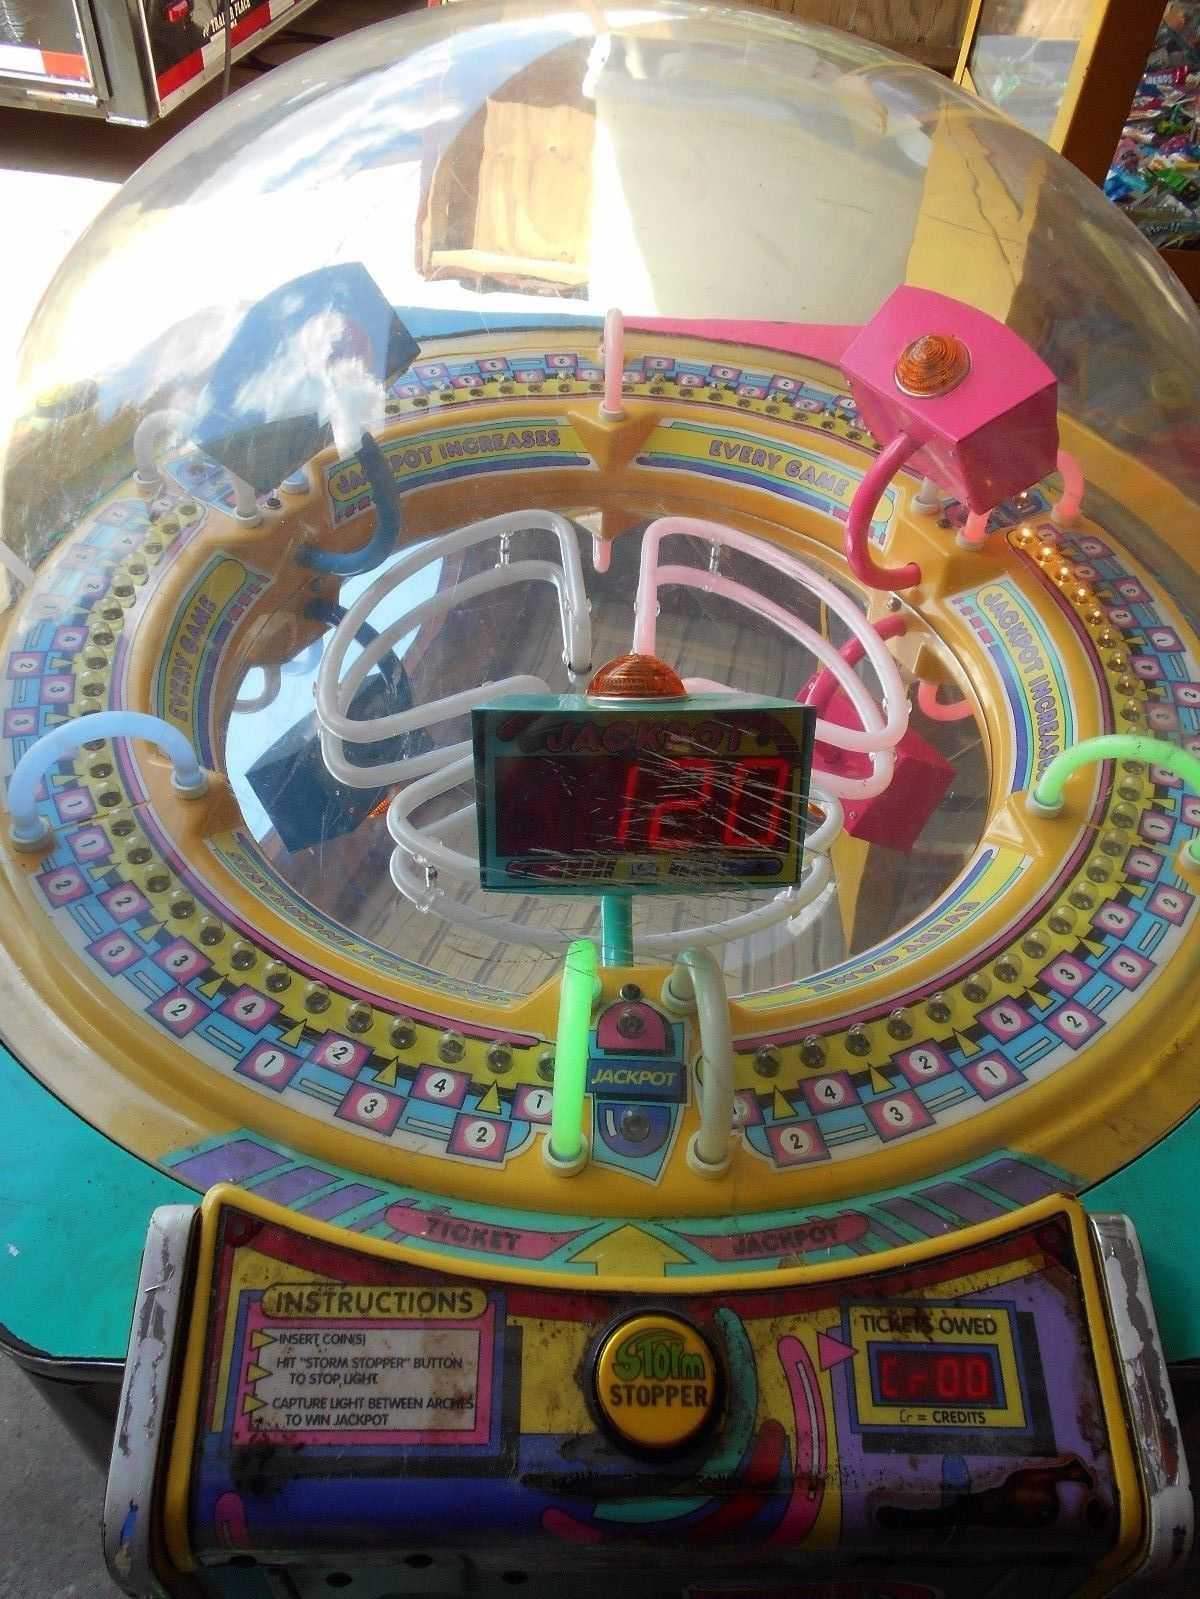 Cyclone Ticket Redemption Arcade Game (by Ice) Arcade